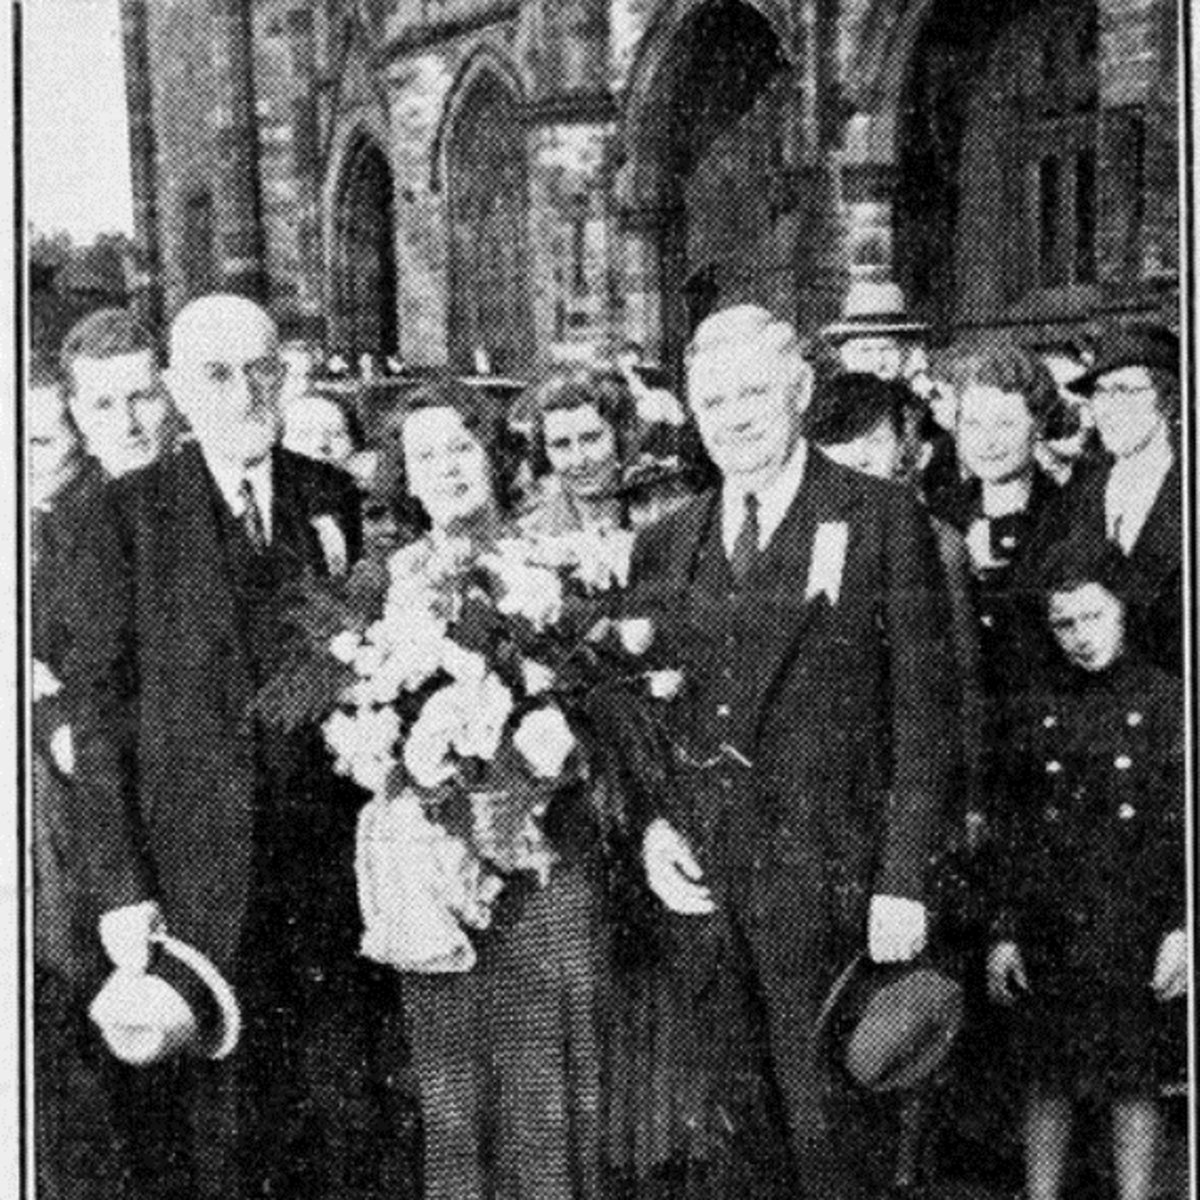 President Heber J. Grant, Catherine Horner, and J. Reuben Clark, July 1937